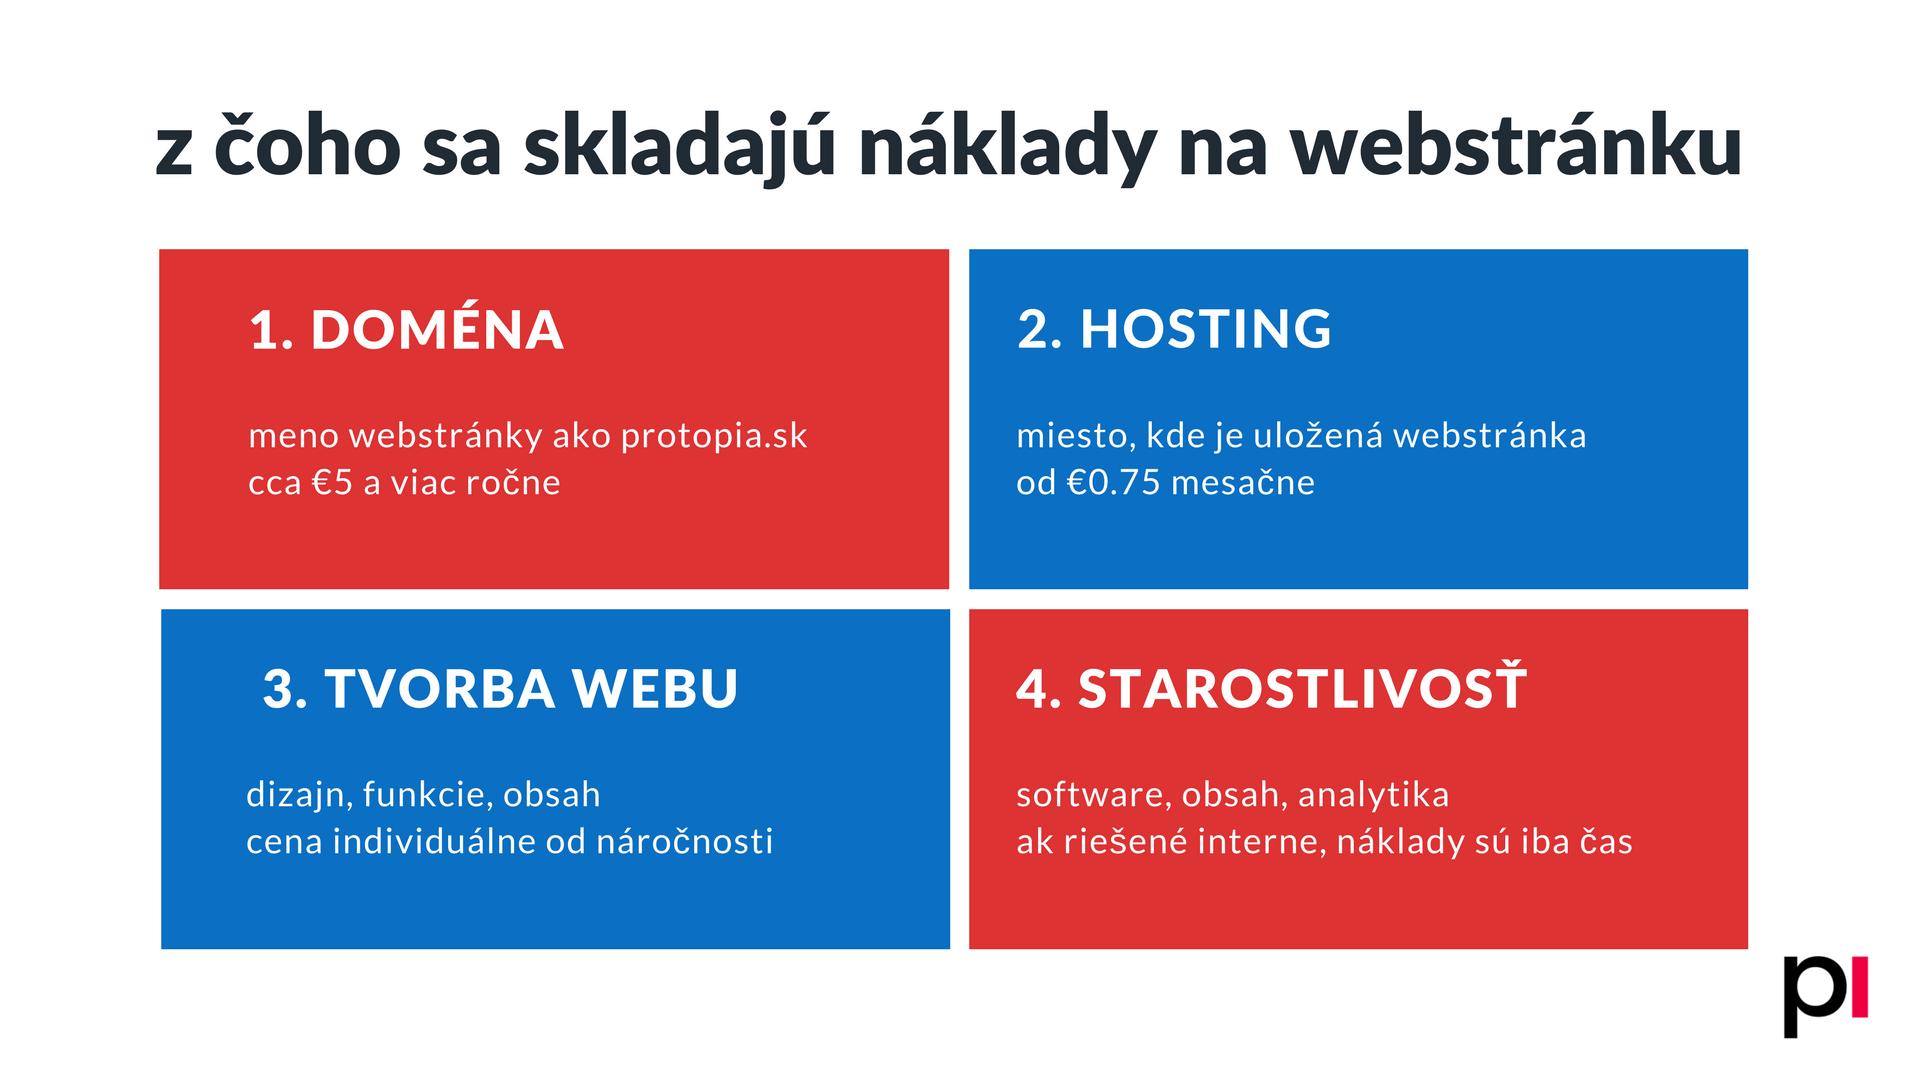 Protopia.sk - náklady na webstránku